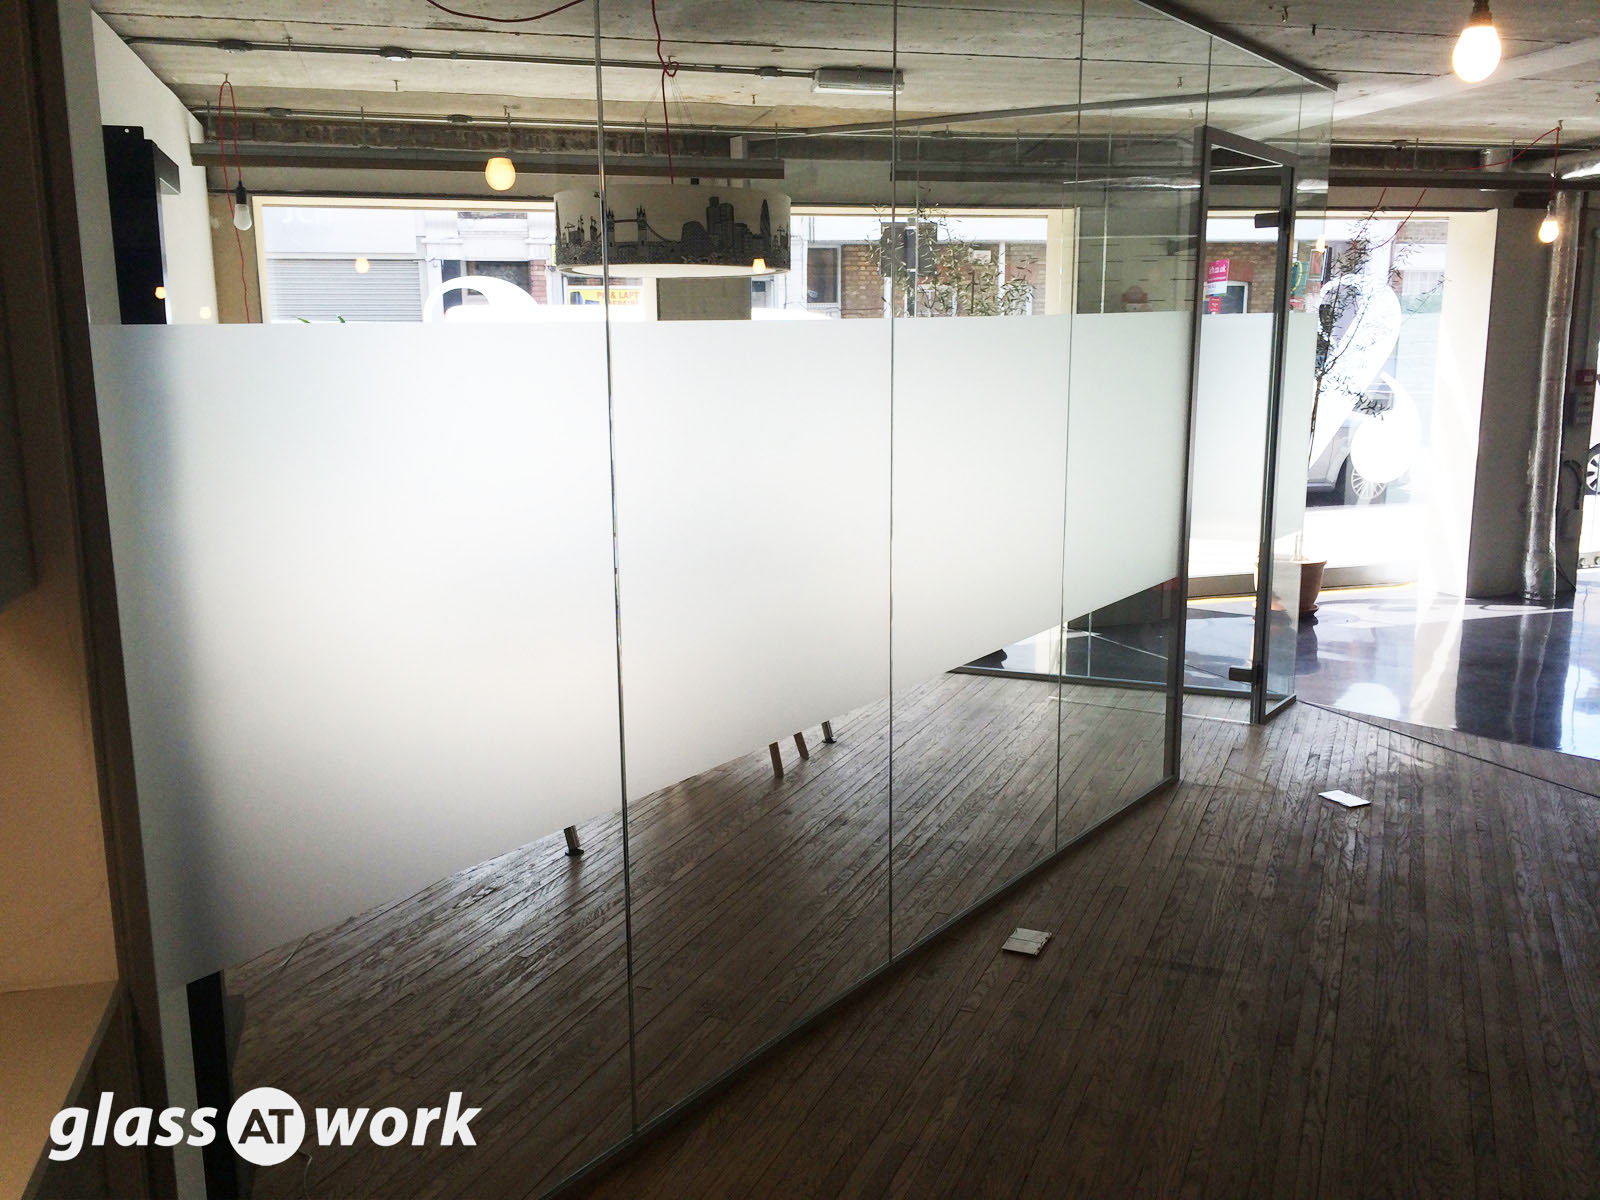 office glass door glazed. Office Glass Door Glazed F